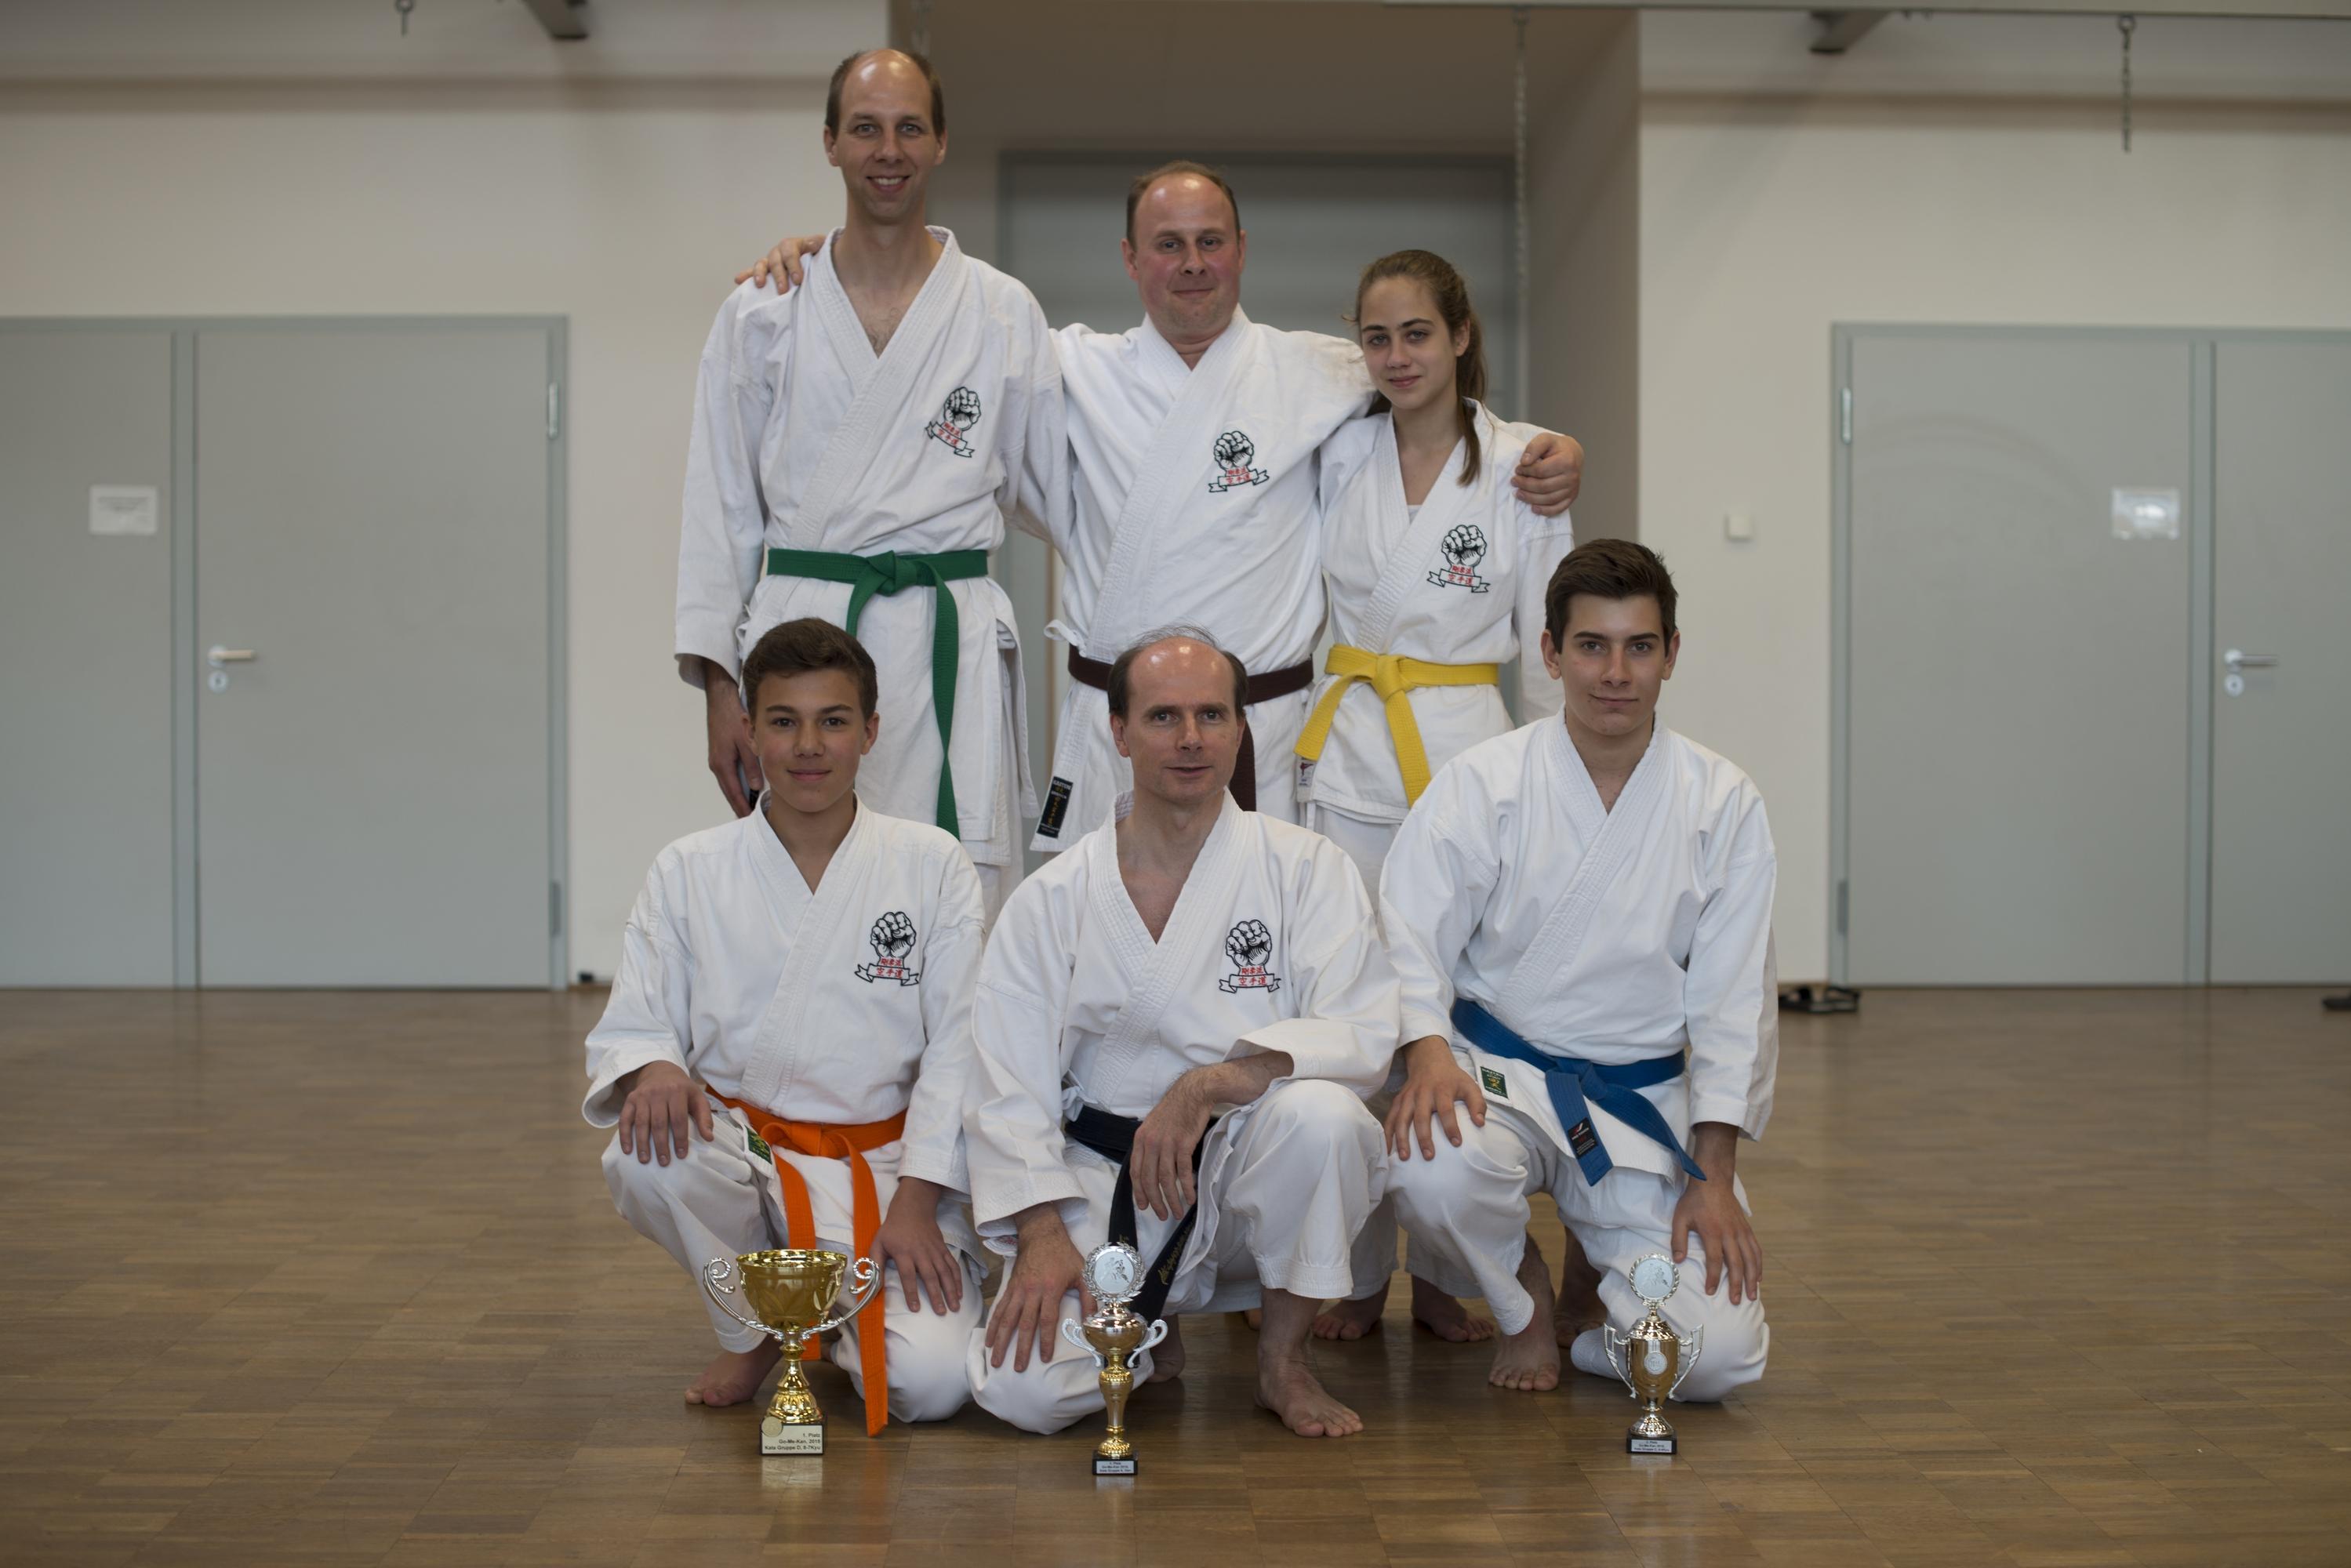 2016-04-26 Kata Turnier Kaarst 369